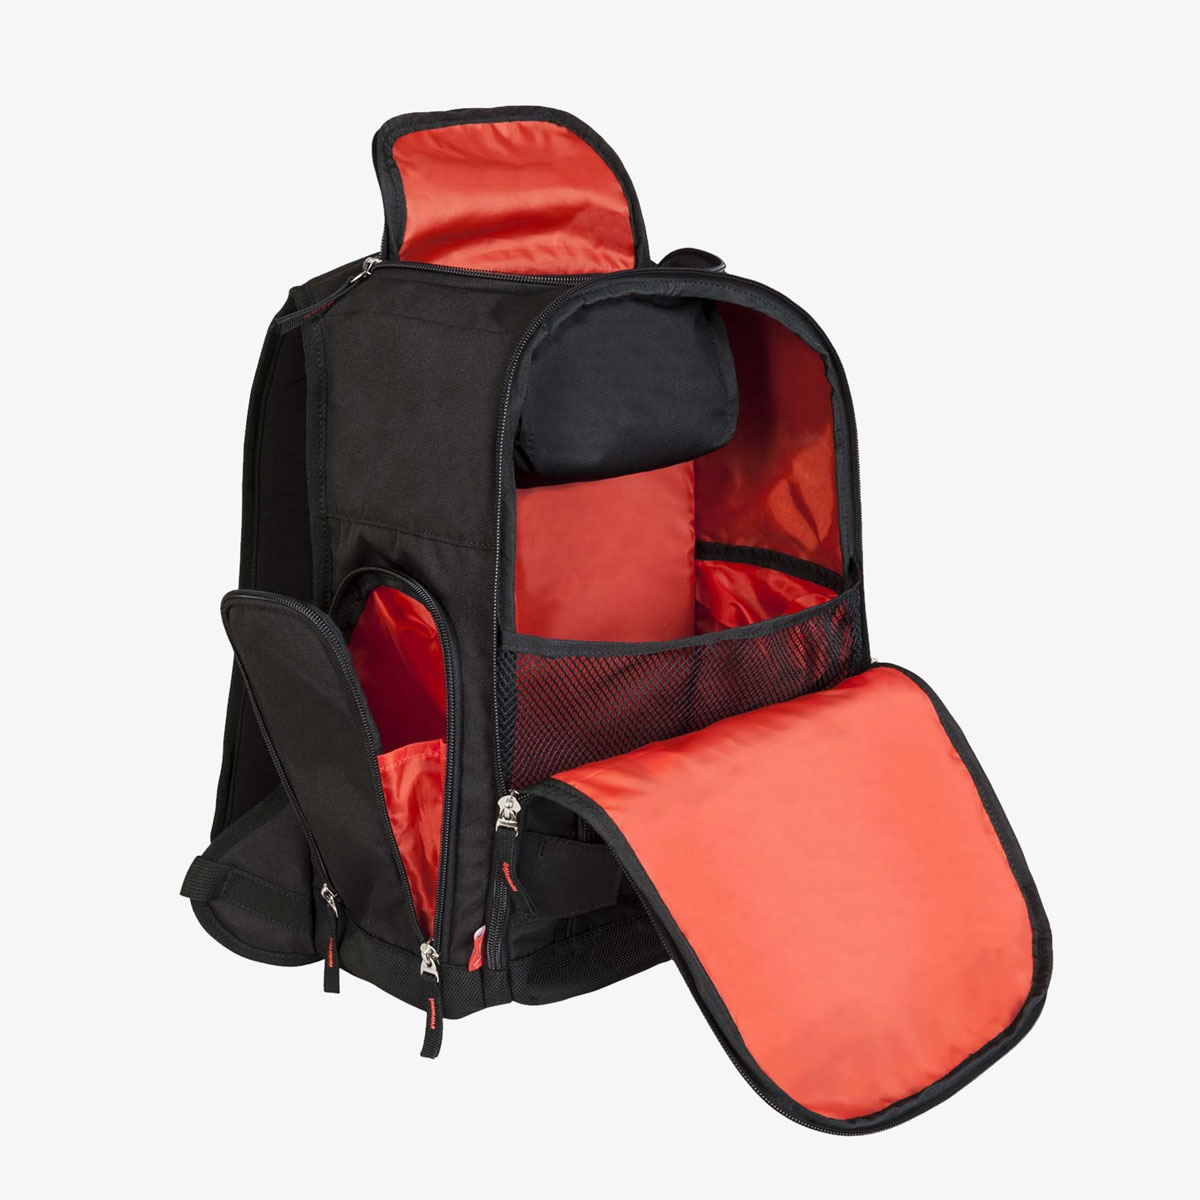 Rok Jurman Design for Target and Viper Bags (Izola) - backpack design